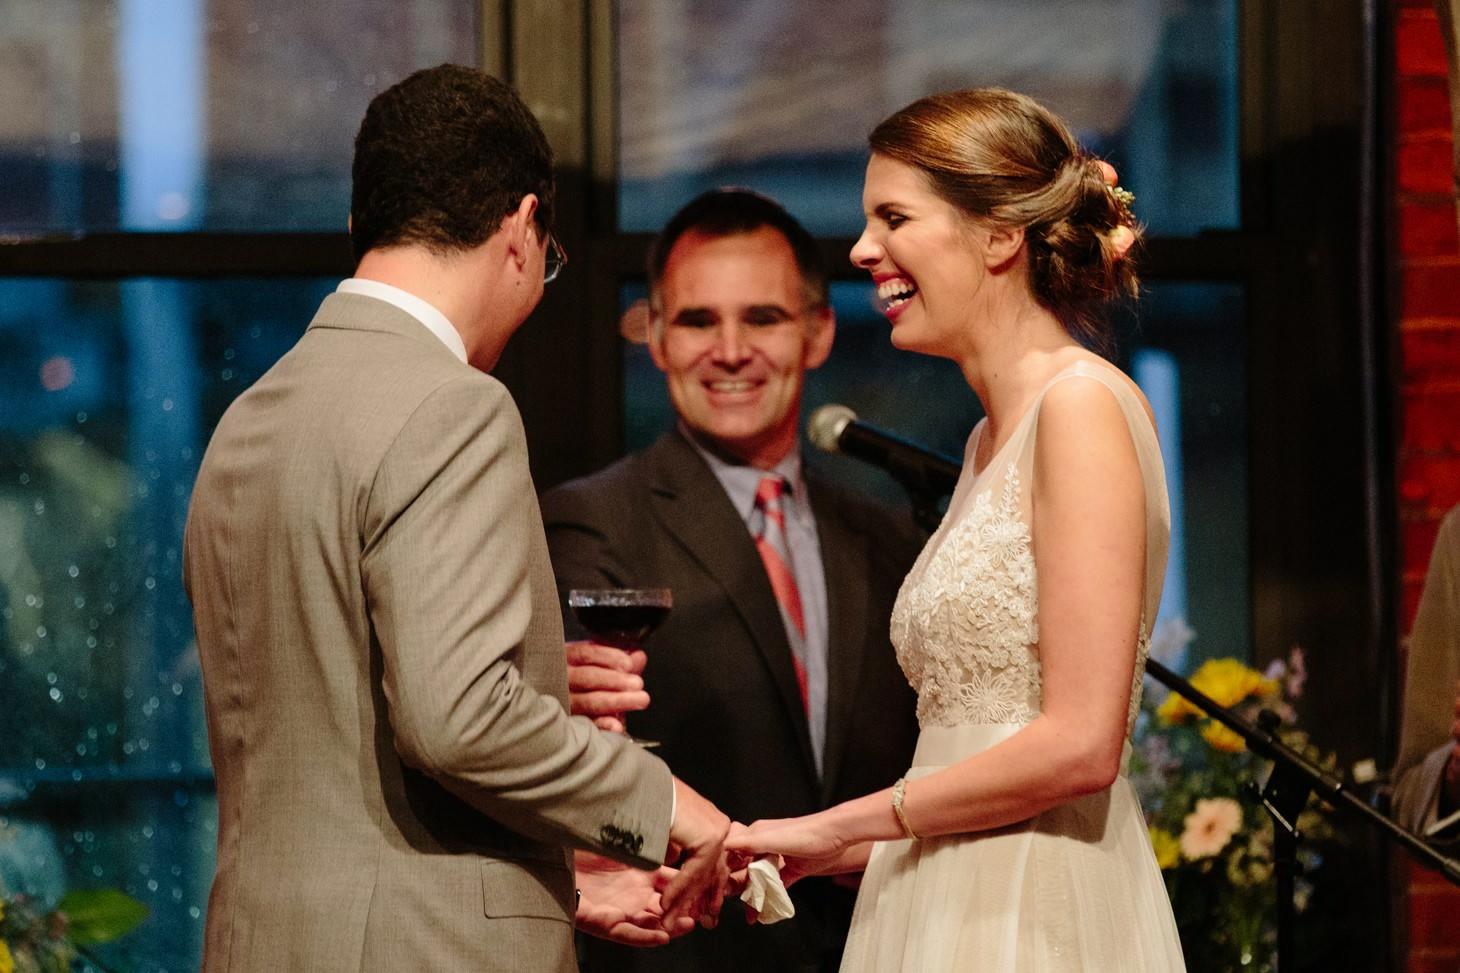 026-nyc-dumbo-loft-brooklyn-wedding-photographer-smitten-chickens-photo-.jpg